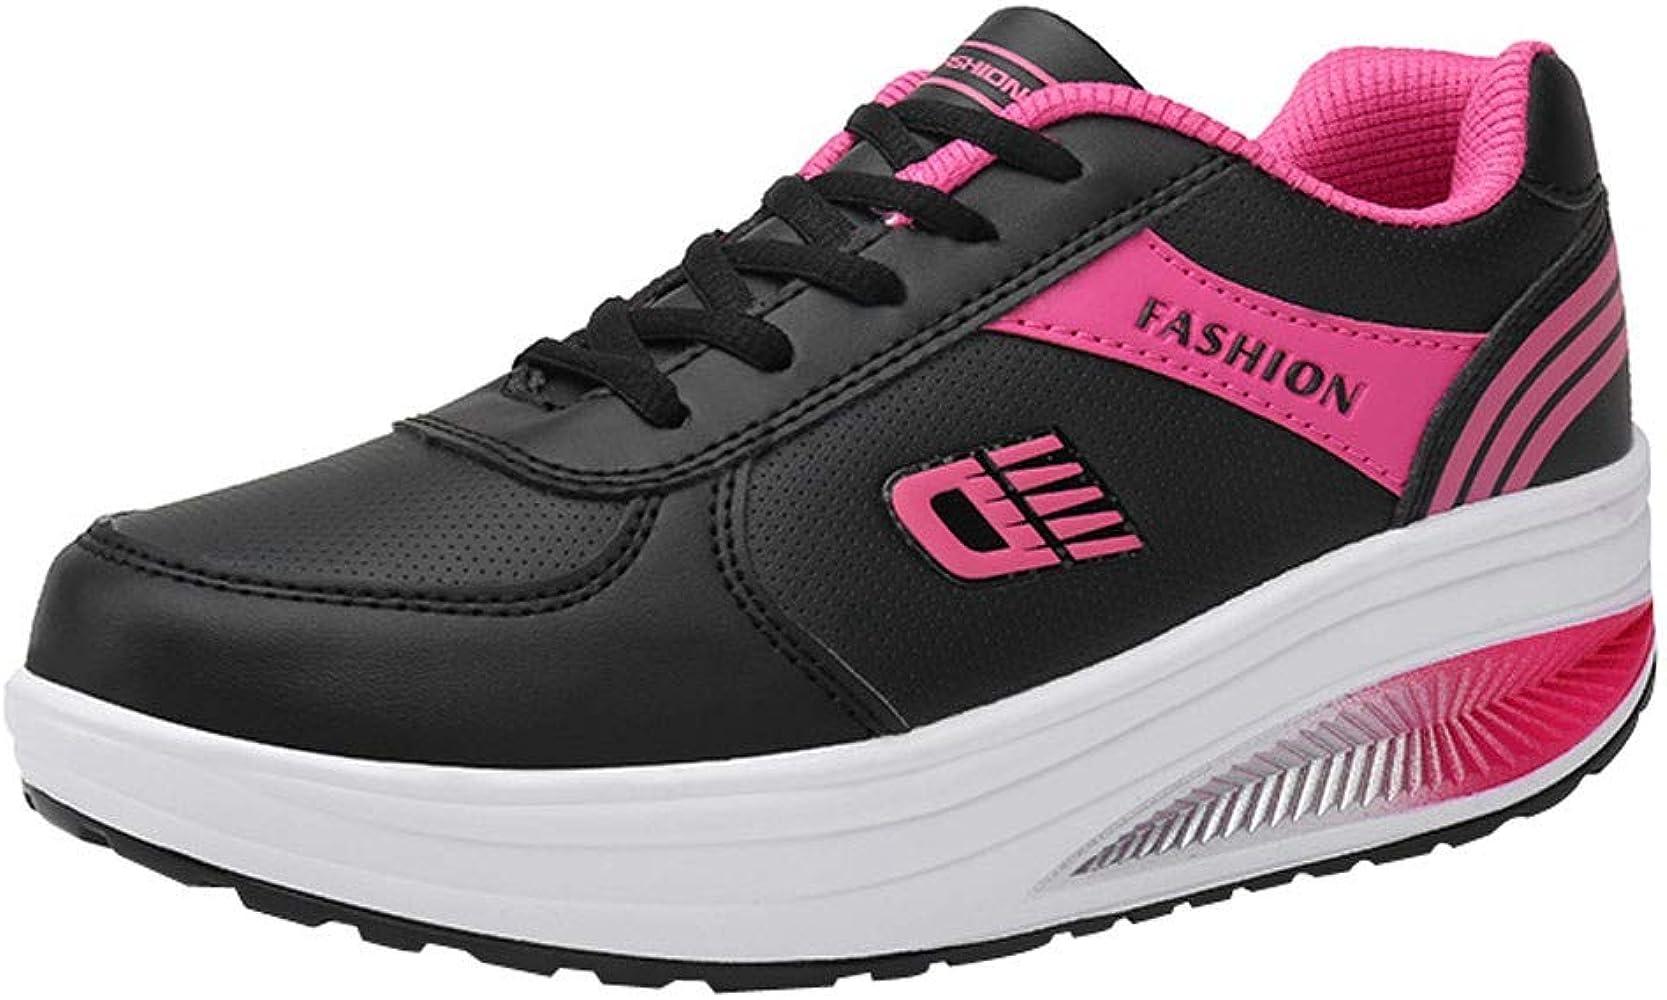 Zapatillas Running de Estudiante Sneakers Fitness,BBestseller Zapatos para Correr En Montaña Asfalto Aire Libre Deportes Casual de Calzado Deportivo: Amazon.es: Zapatos y complementos